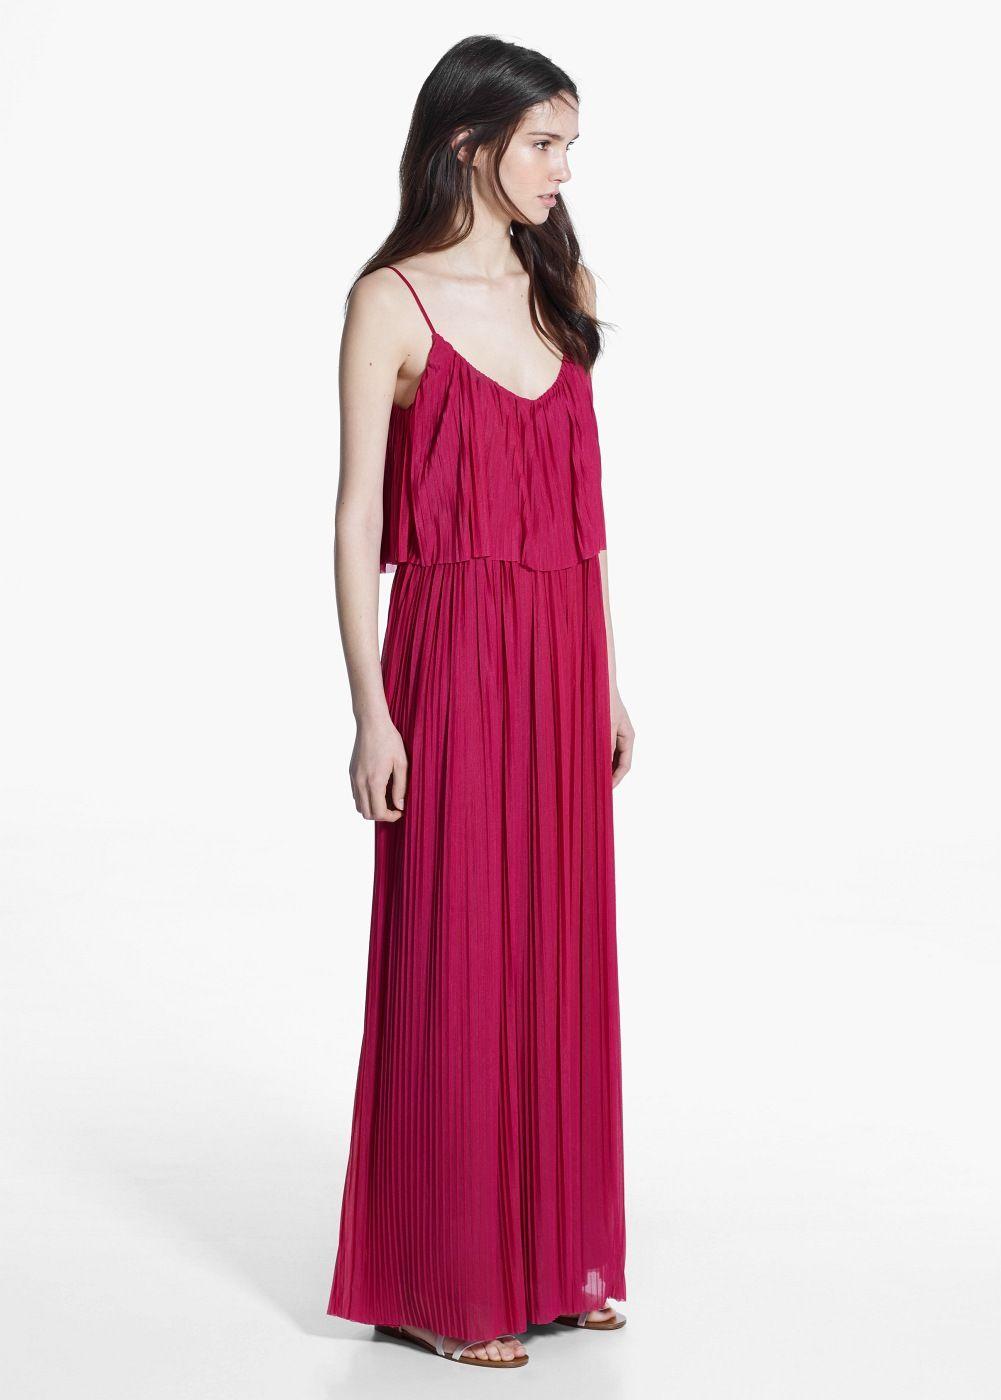 4083129b8322f Long pleated dress Robe Longue Mango, Sac, Doublure, Bretelles, Femme